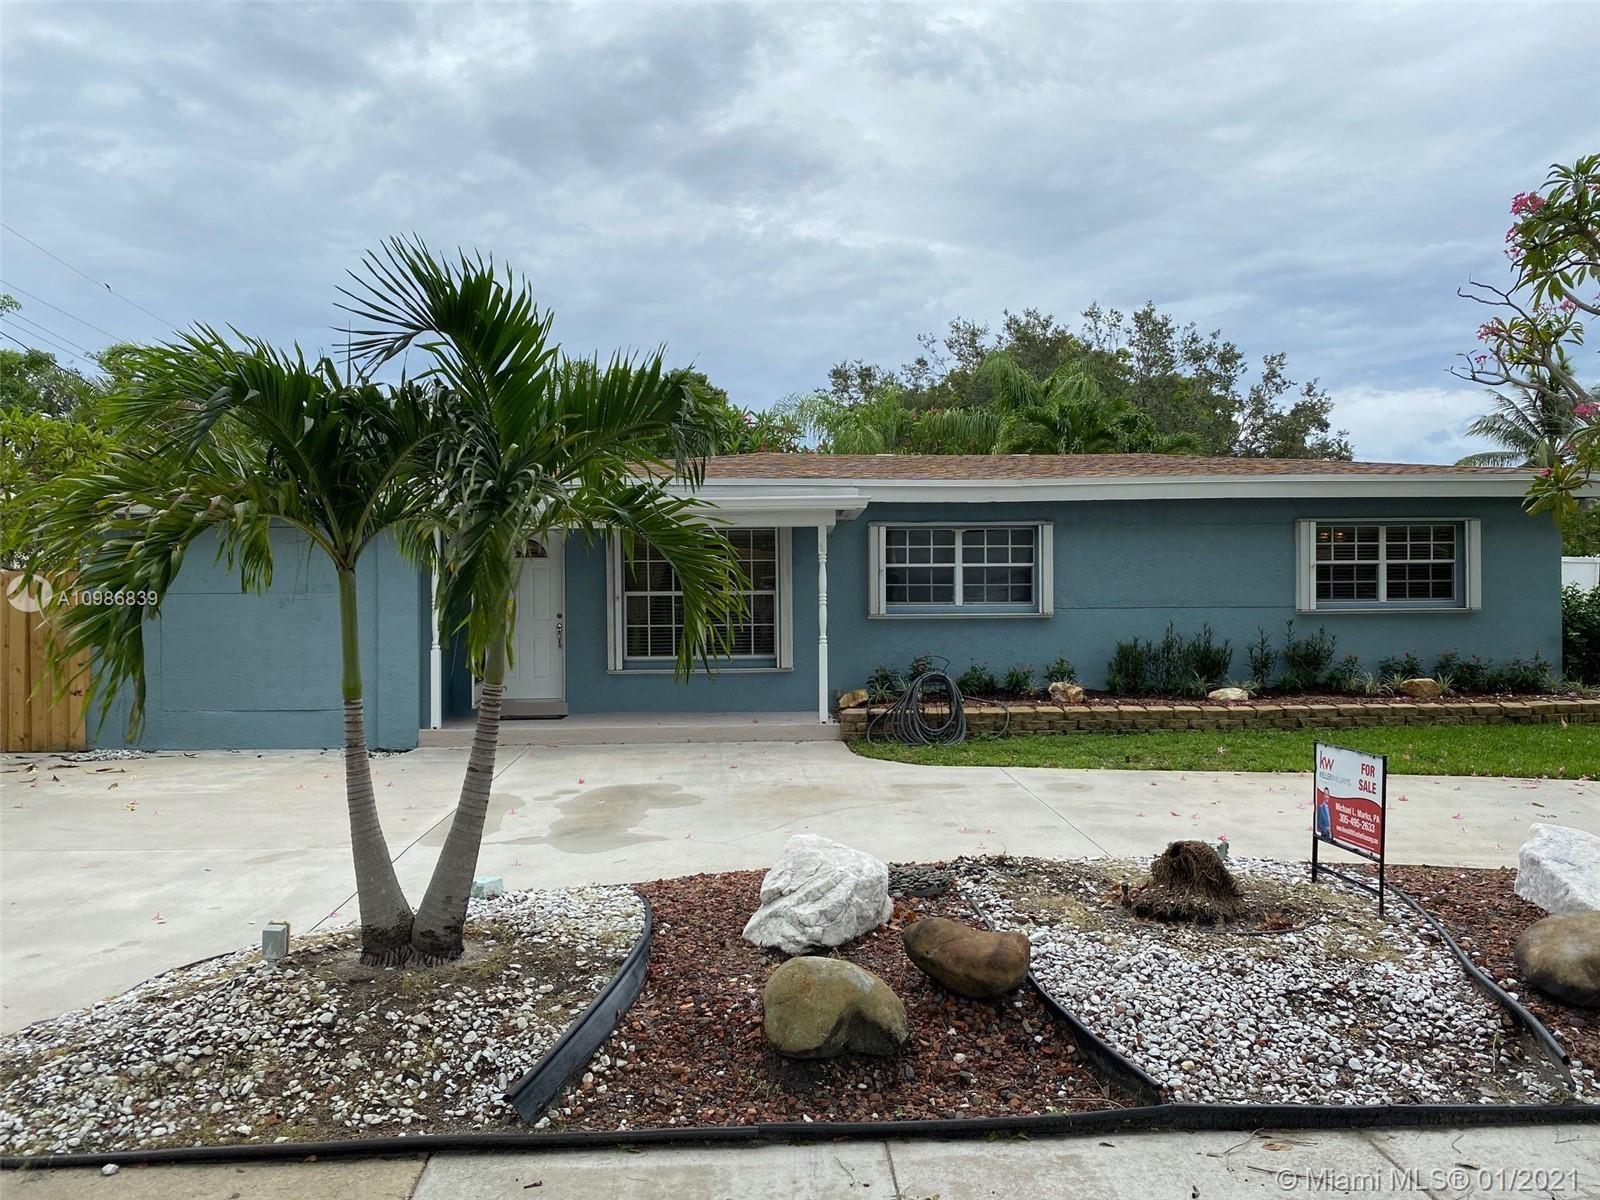 940 SW 3rd Ave, Pompano Beach, FL 33060 - #: A10986839